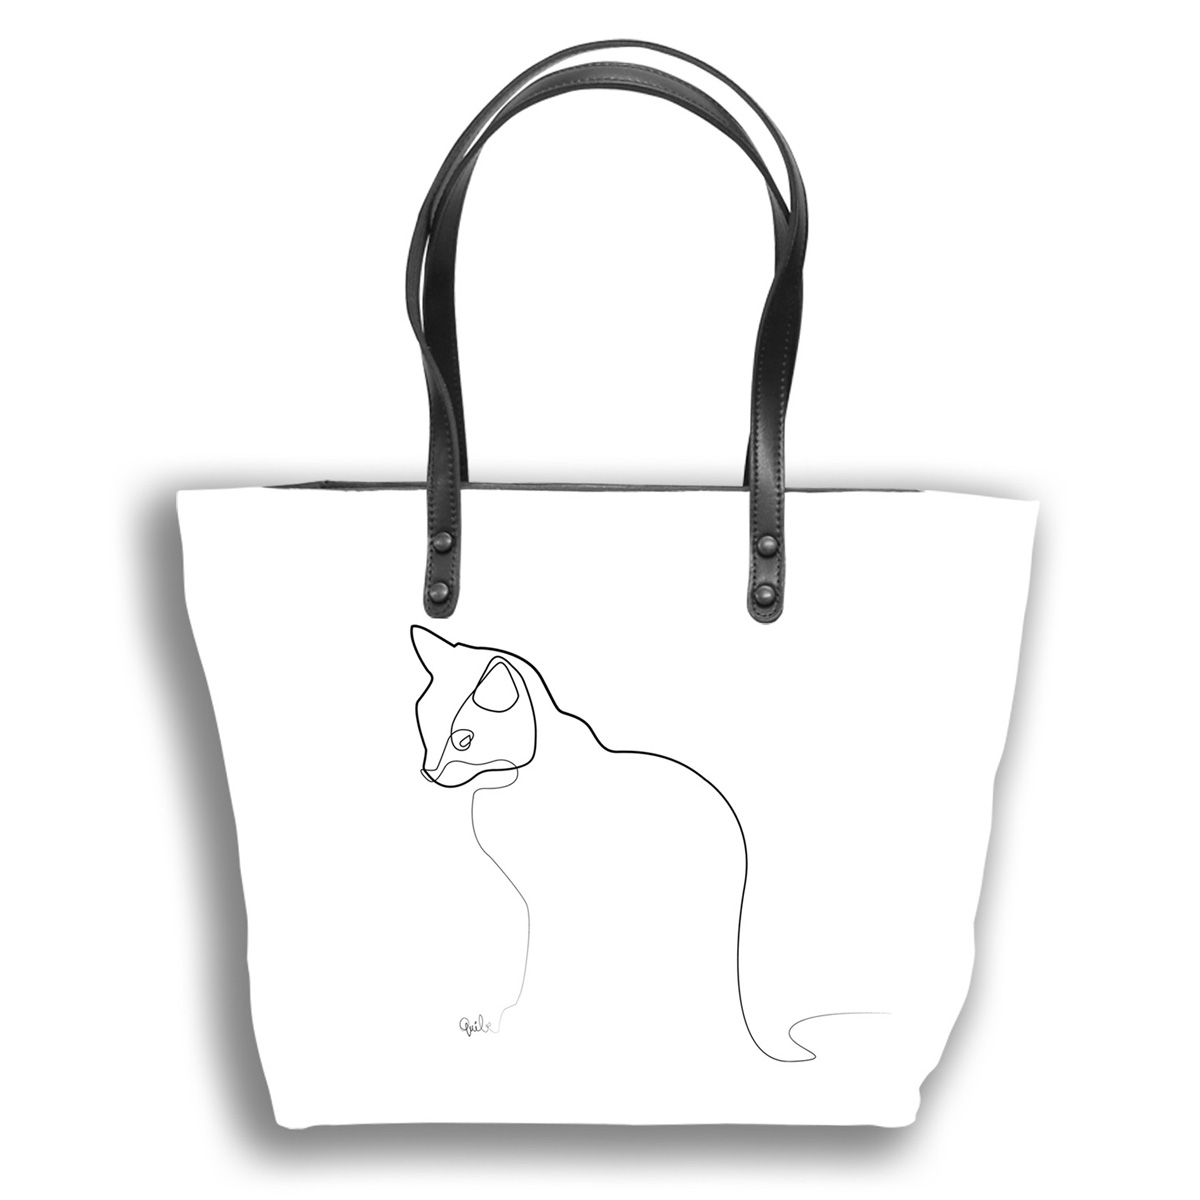 Sac créateur artisanal \'Quibe\' blanc noir (Chat)  - 44x27x14 cm - [A0340]